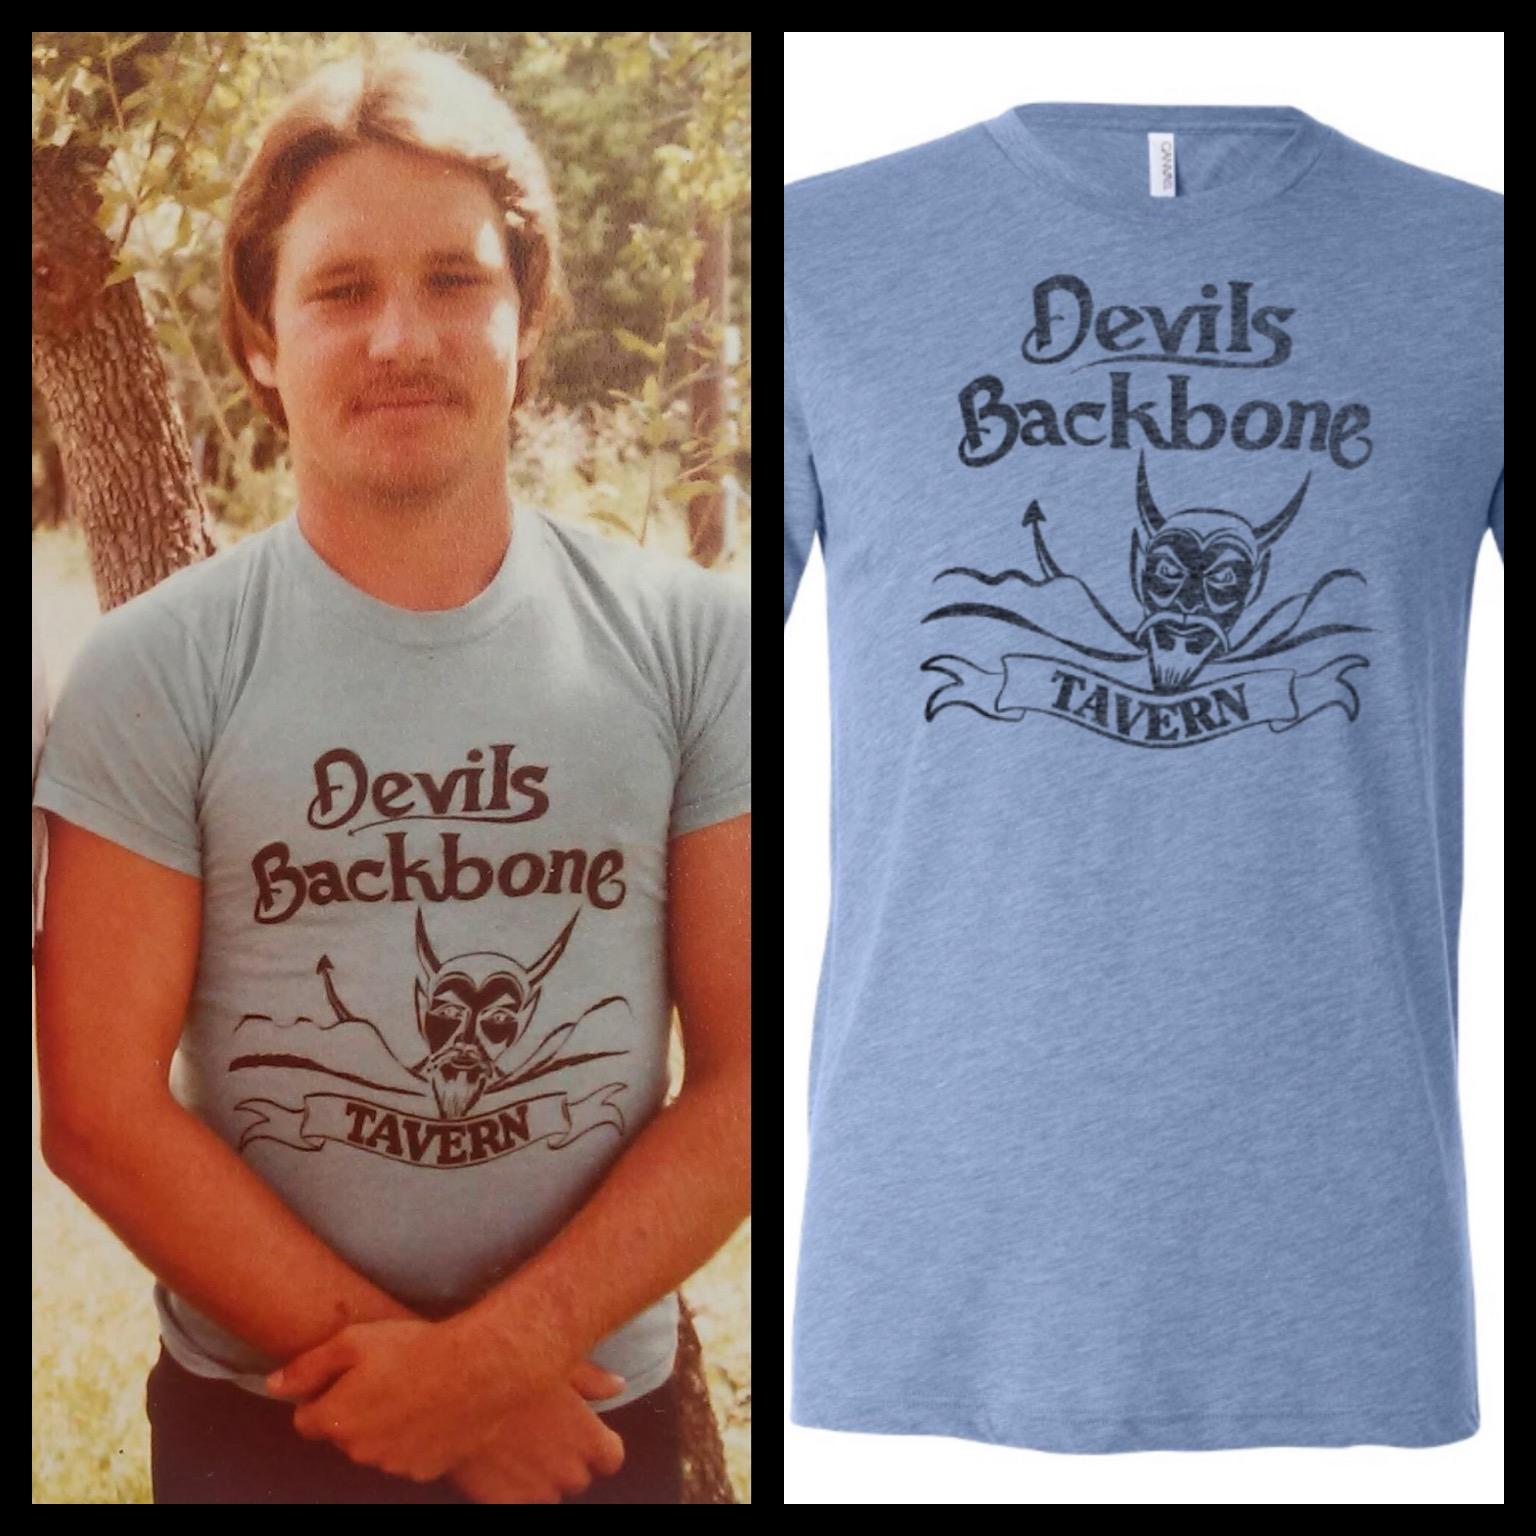 Vintage Backbone Tee w Devil - Not today Satan!